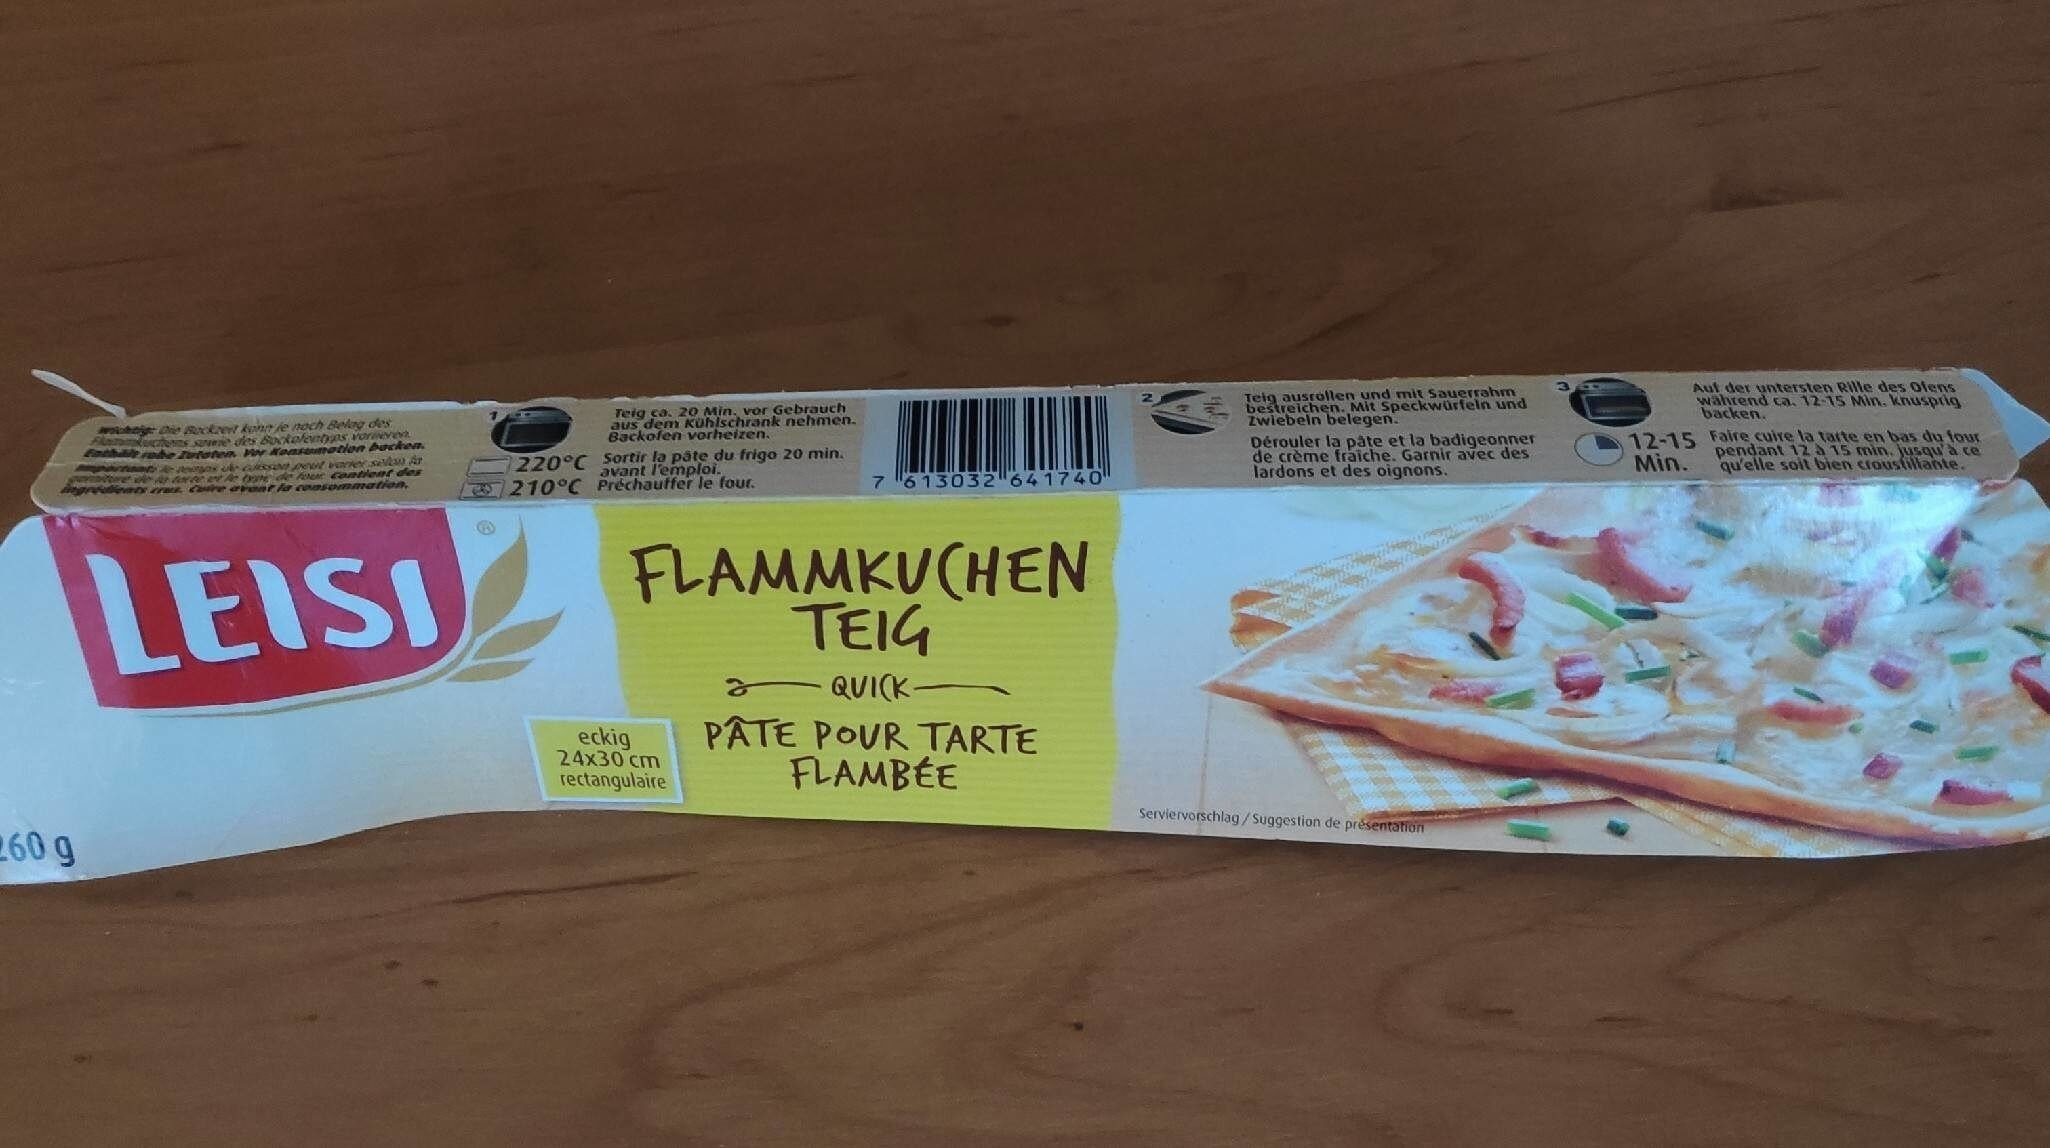 Teig Flammkuchen - Product - fr